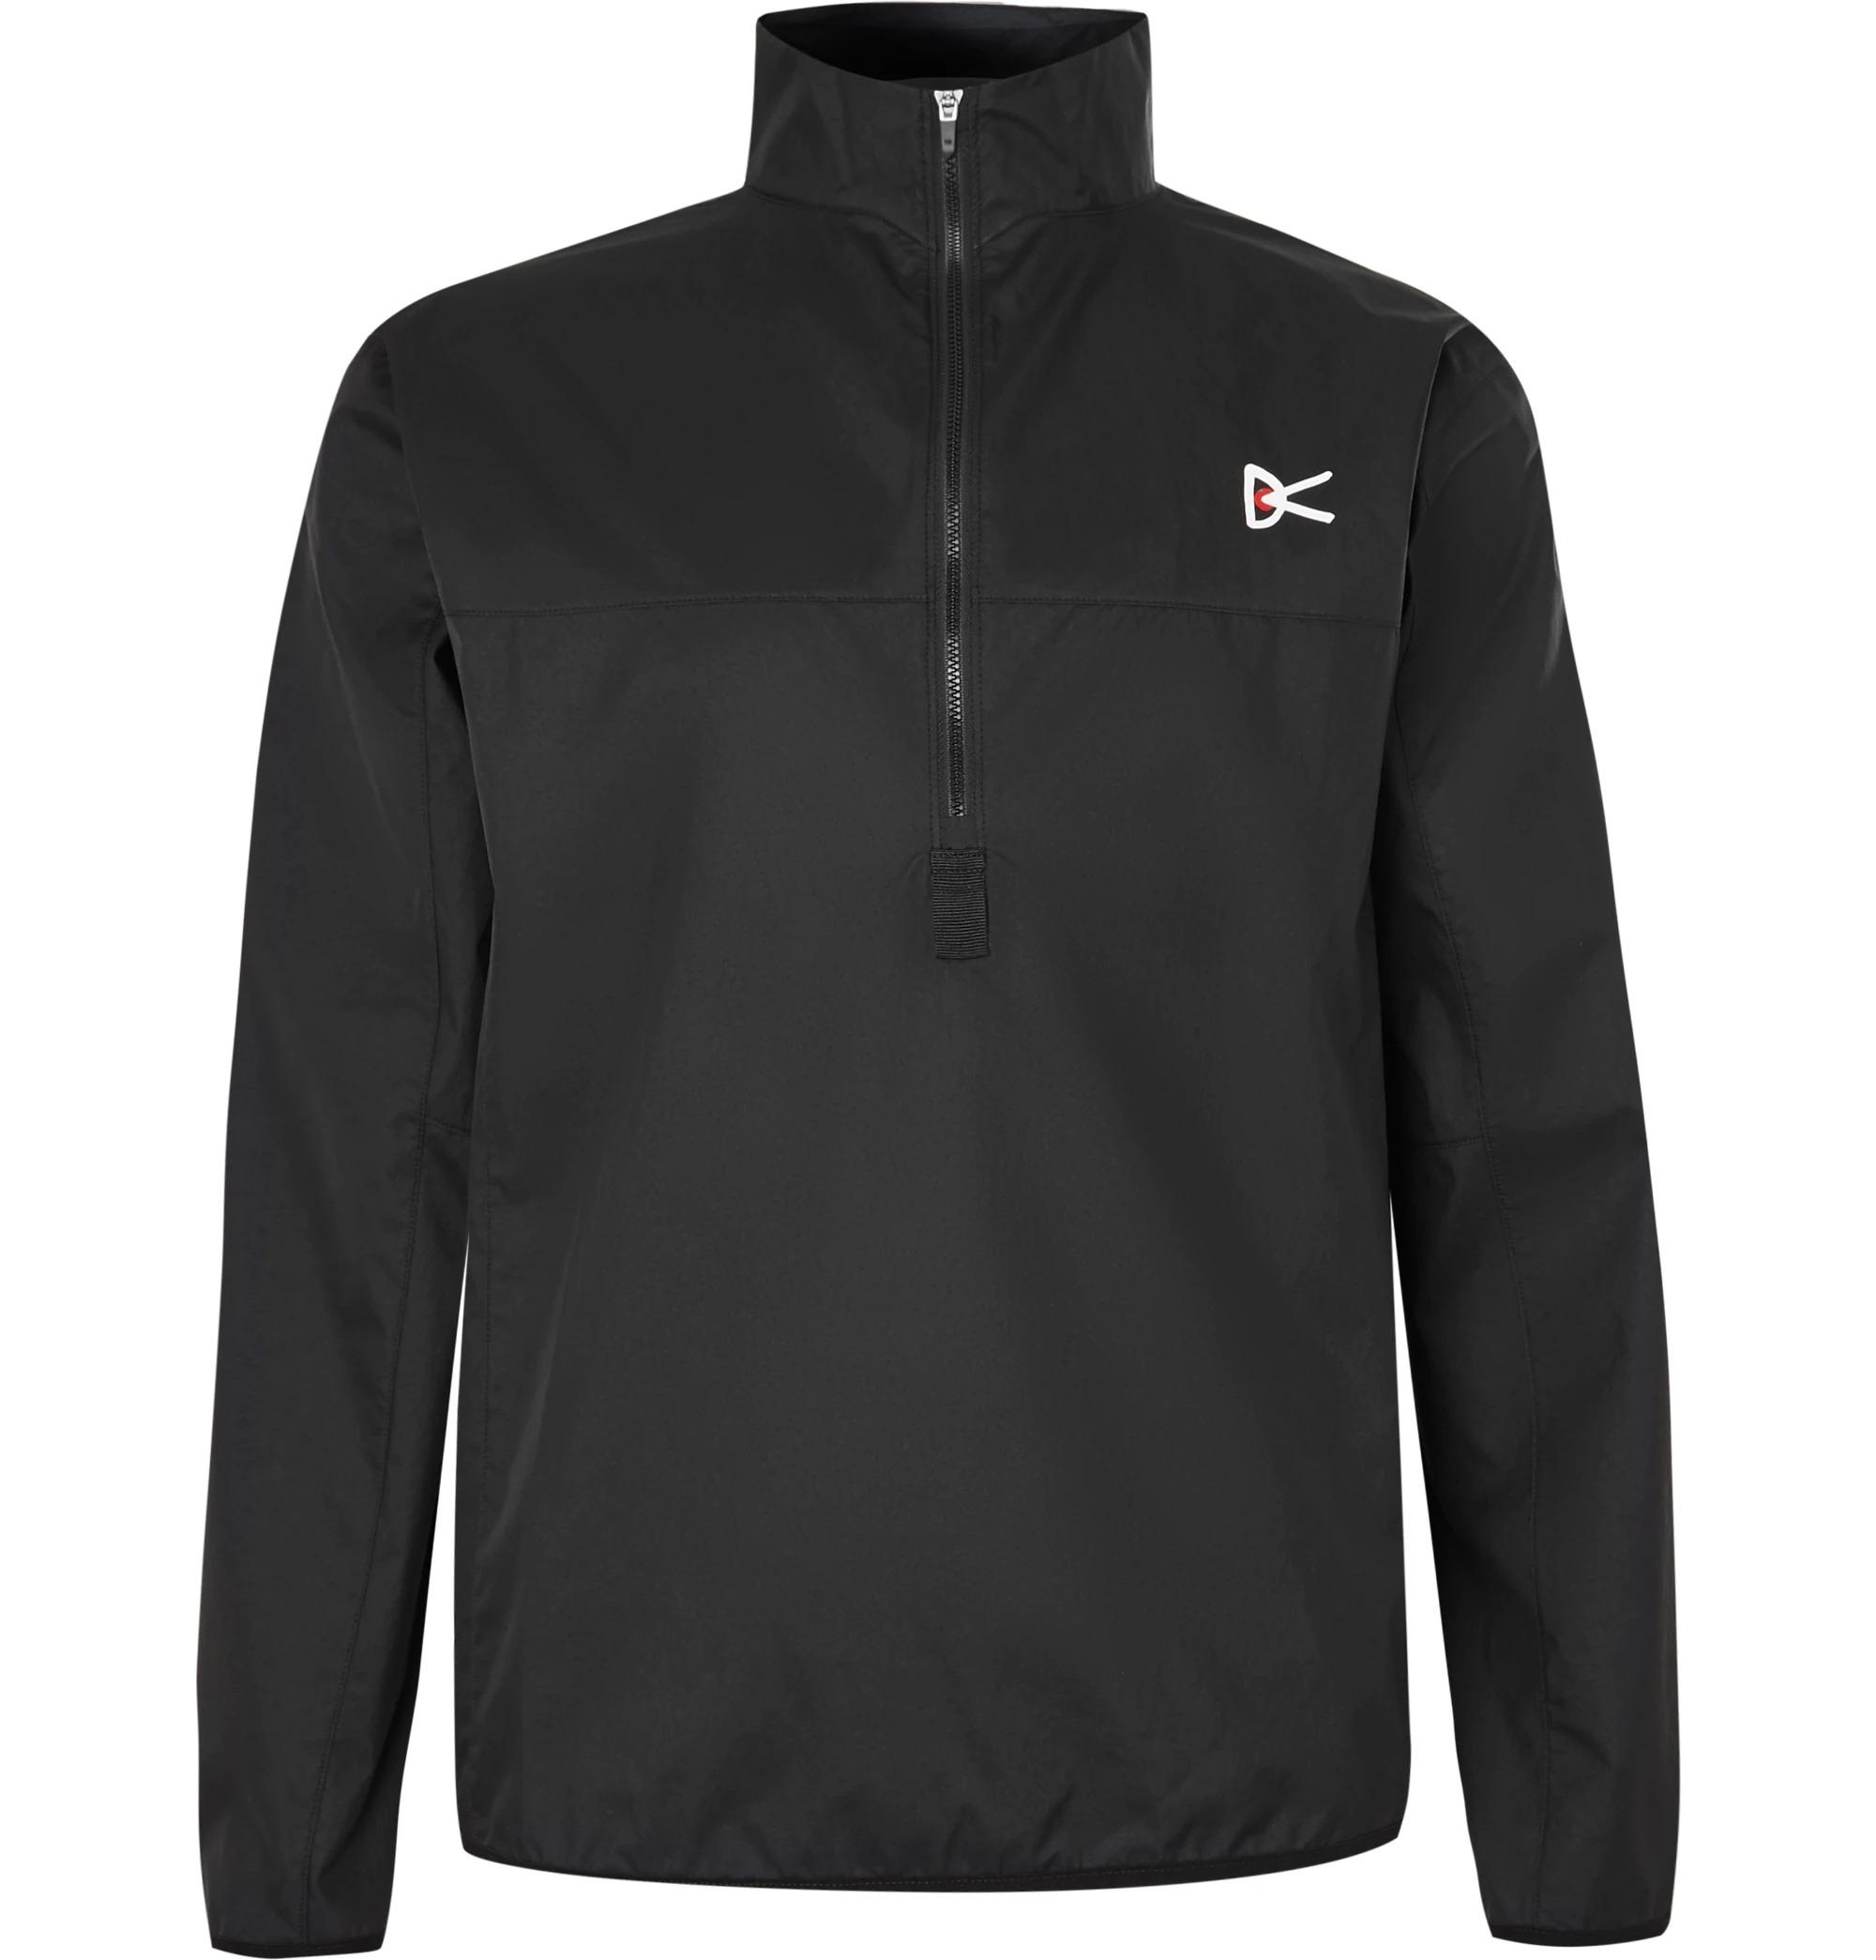 luxe running jacket